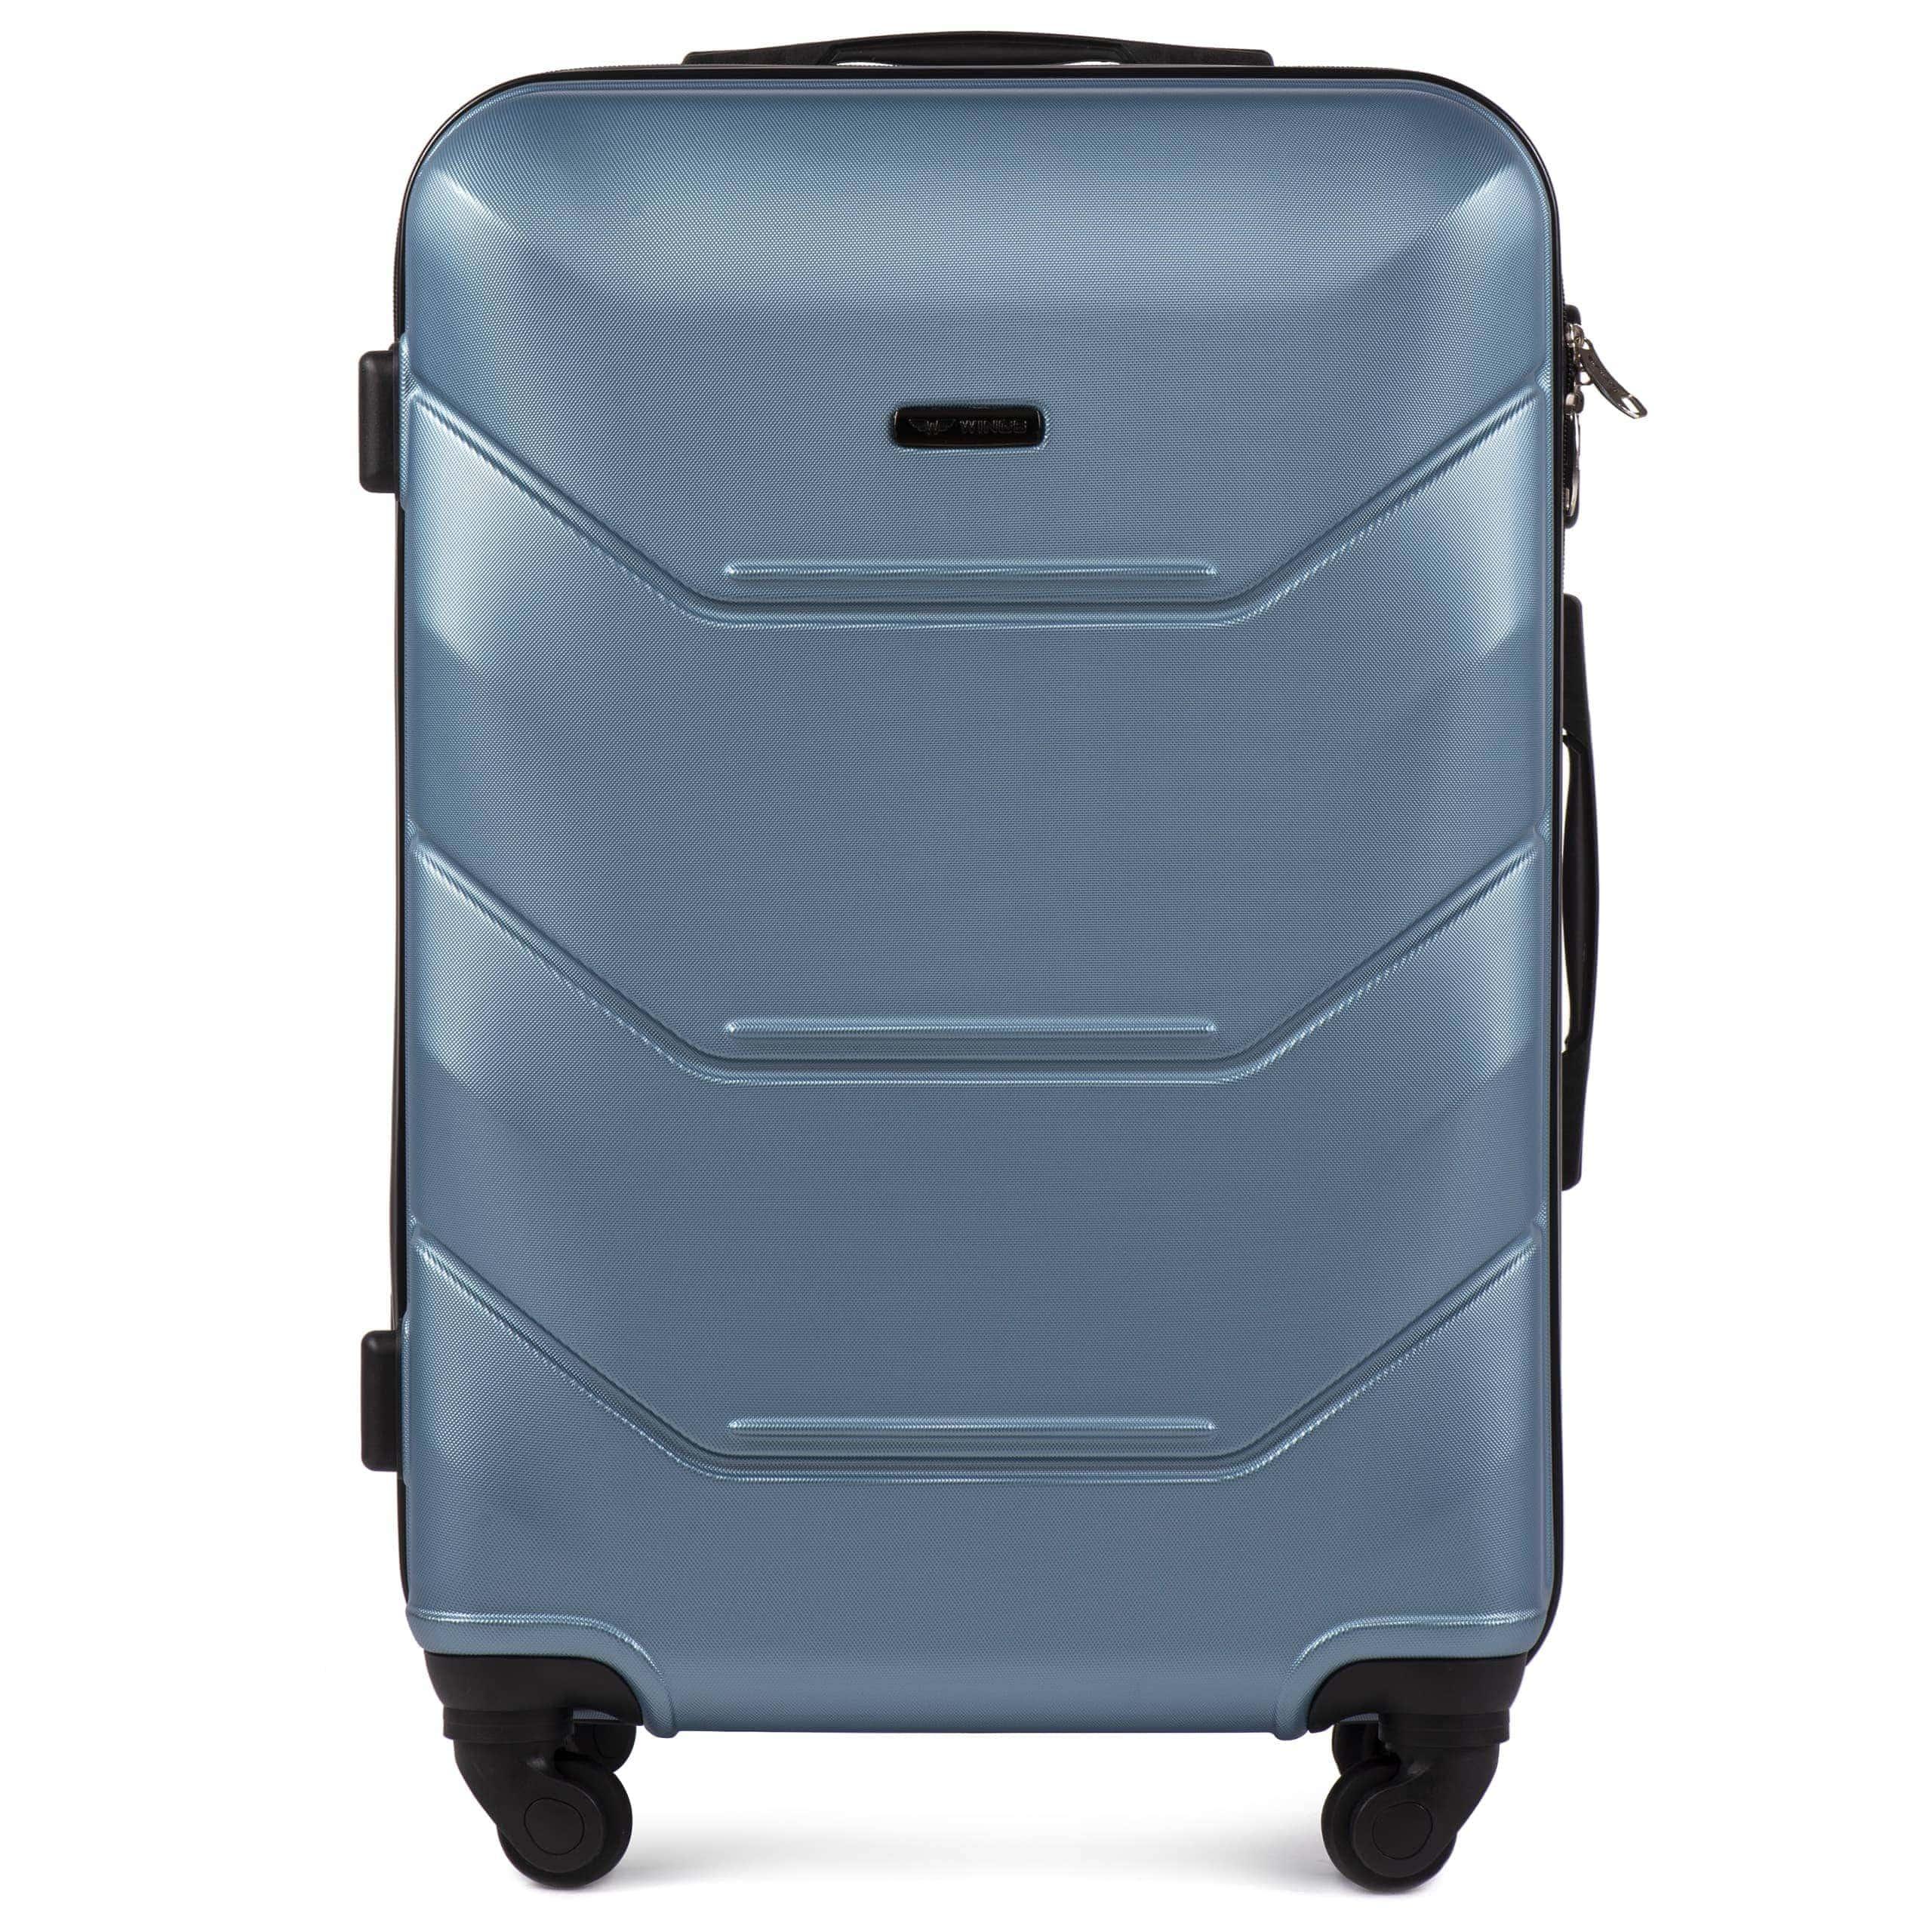 СРЕДНИЙ ЧЕМОДАН WINGS 147 M BLUE-SILVER PREMIUM НА 4-Х КАУЧУКОВЫХ КОЛЕСАХ! Для багажа ,до 18 кг